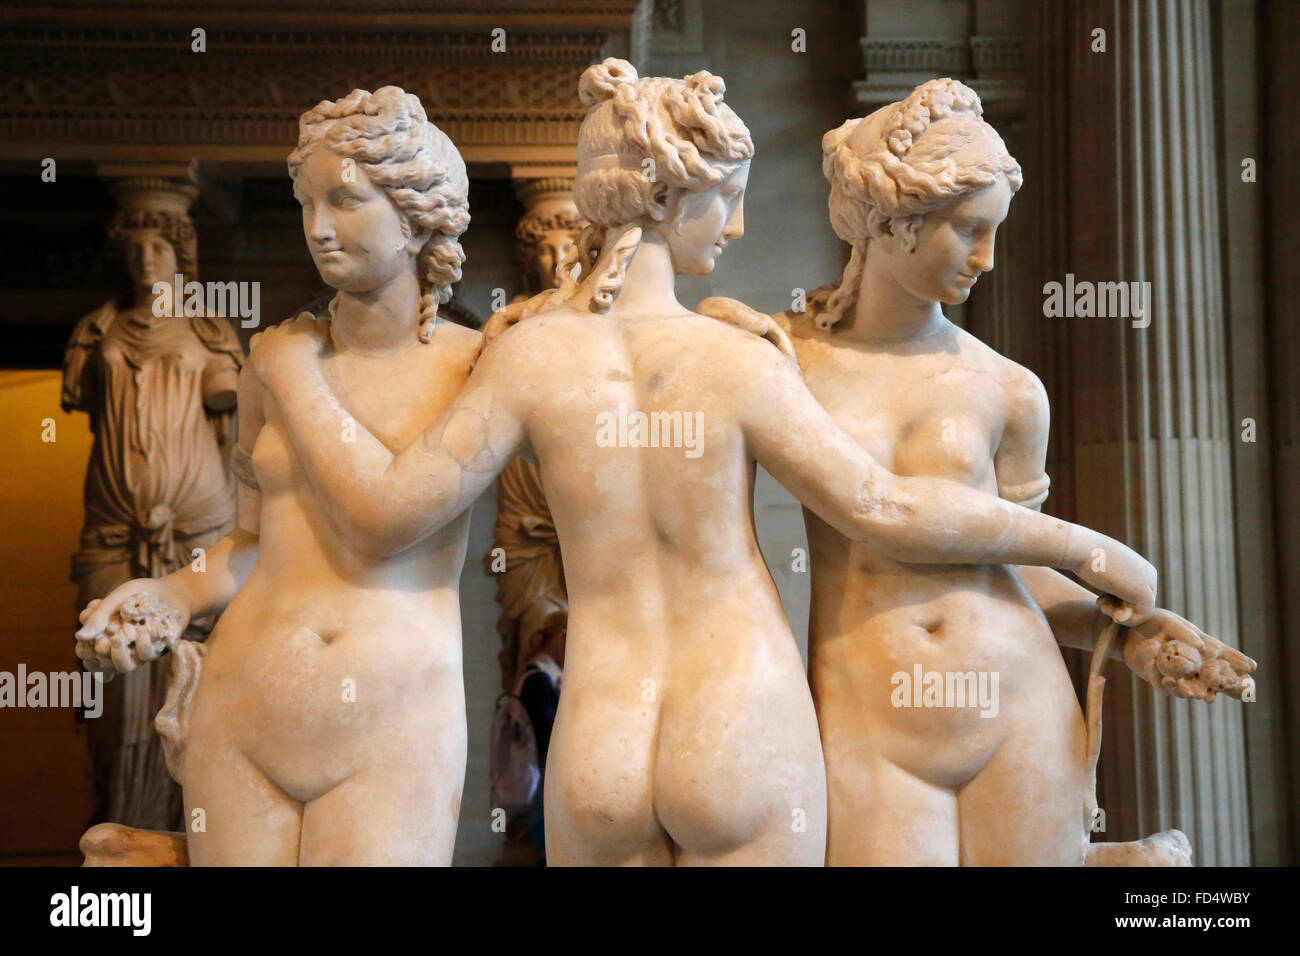 Louvre Museum. Paris. The Three Graces. Second century AD. Marble. Detail. - Stock Image